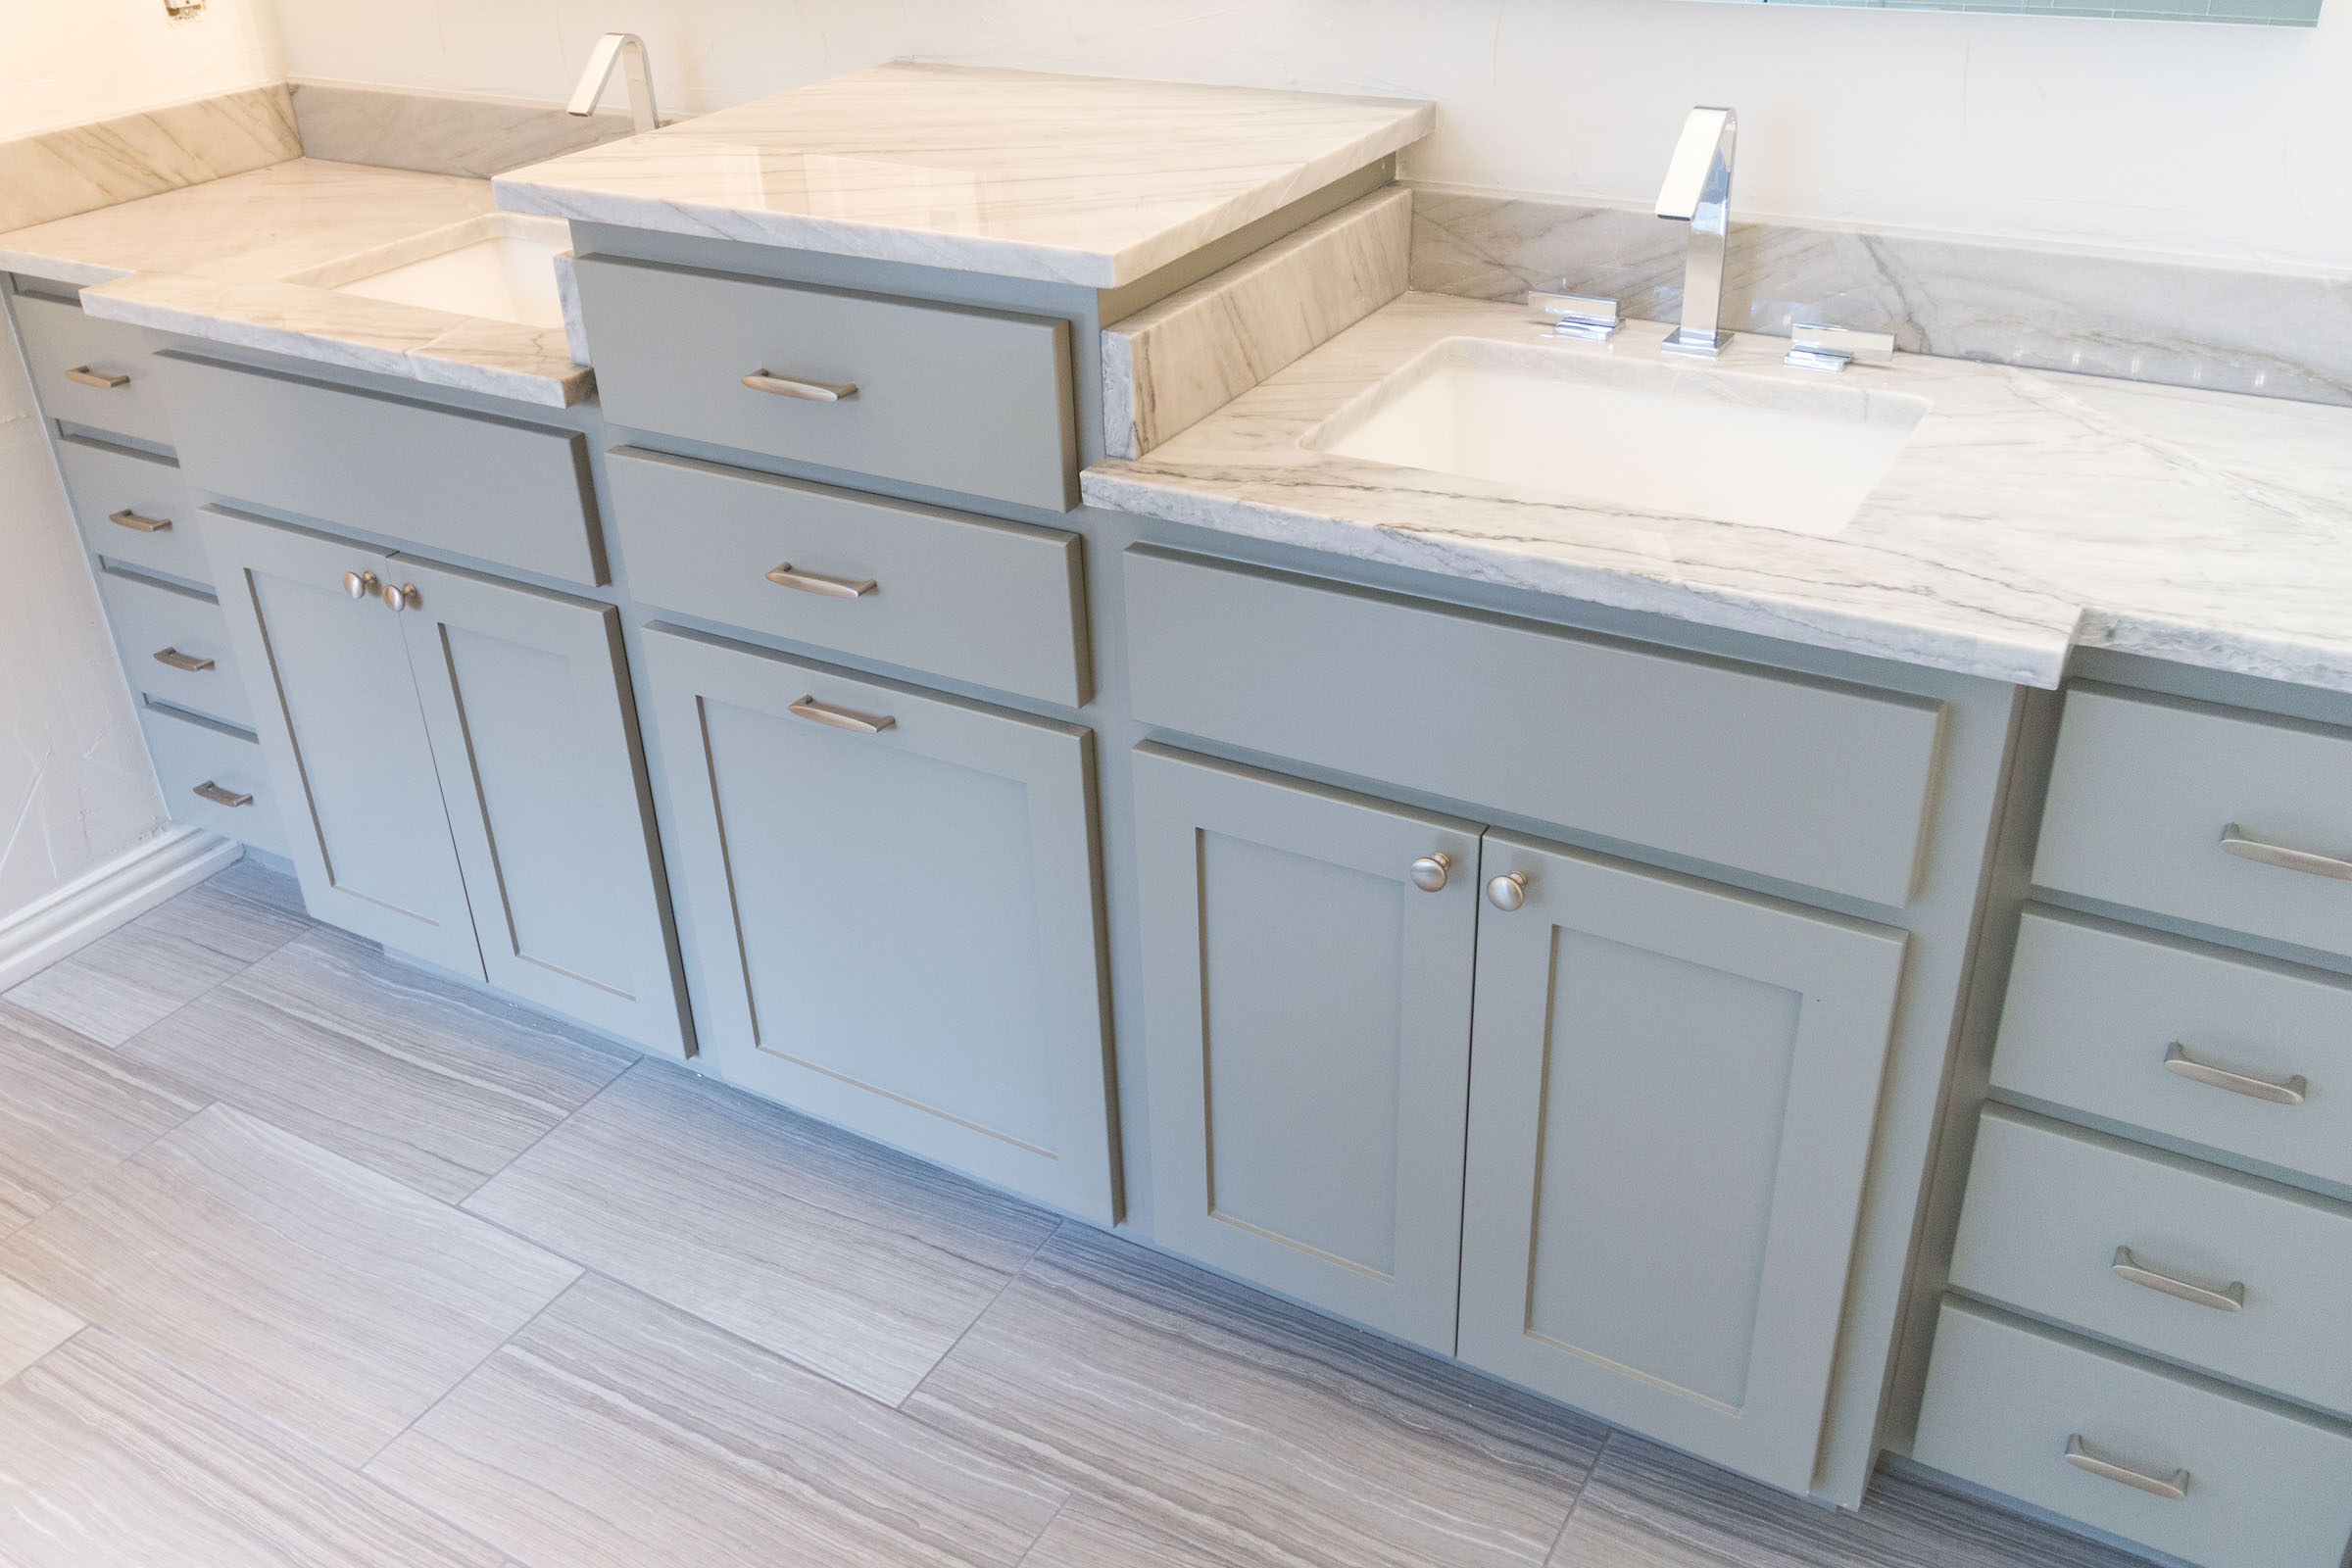 Grey shaker bathroom cabinets, white and grey countertops, grey flooring